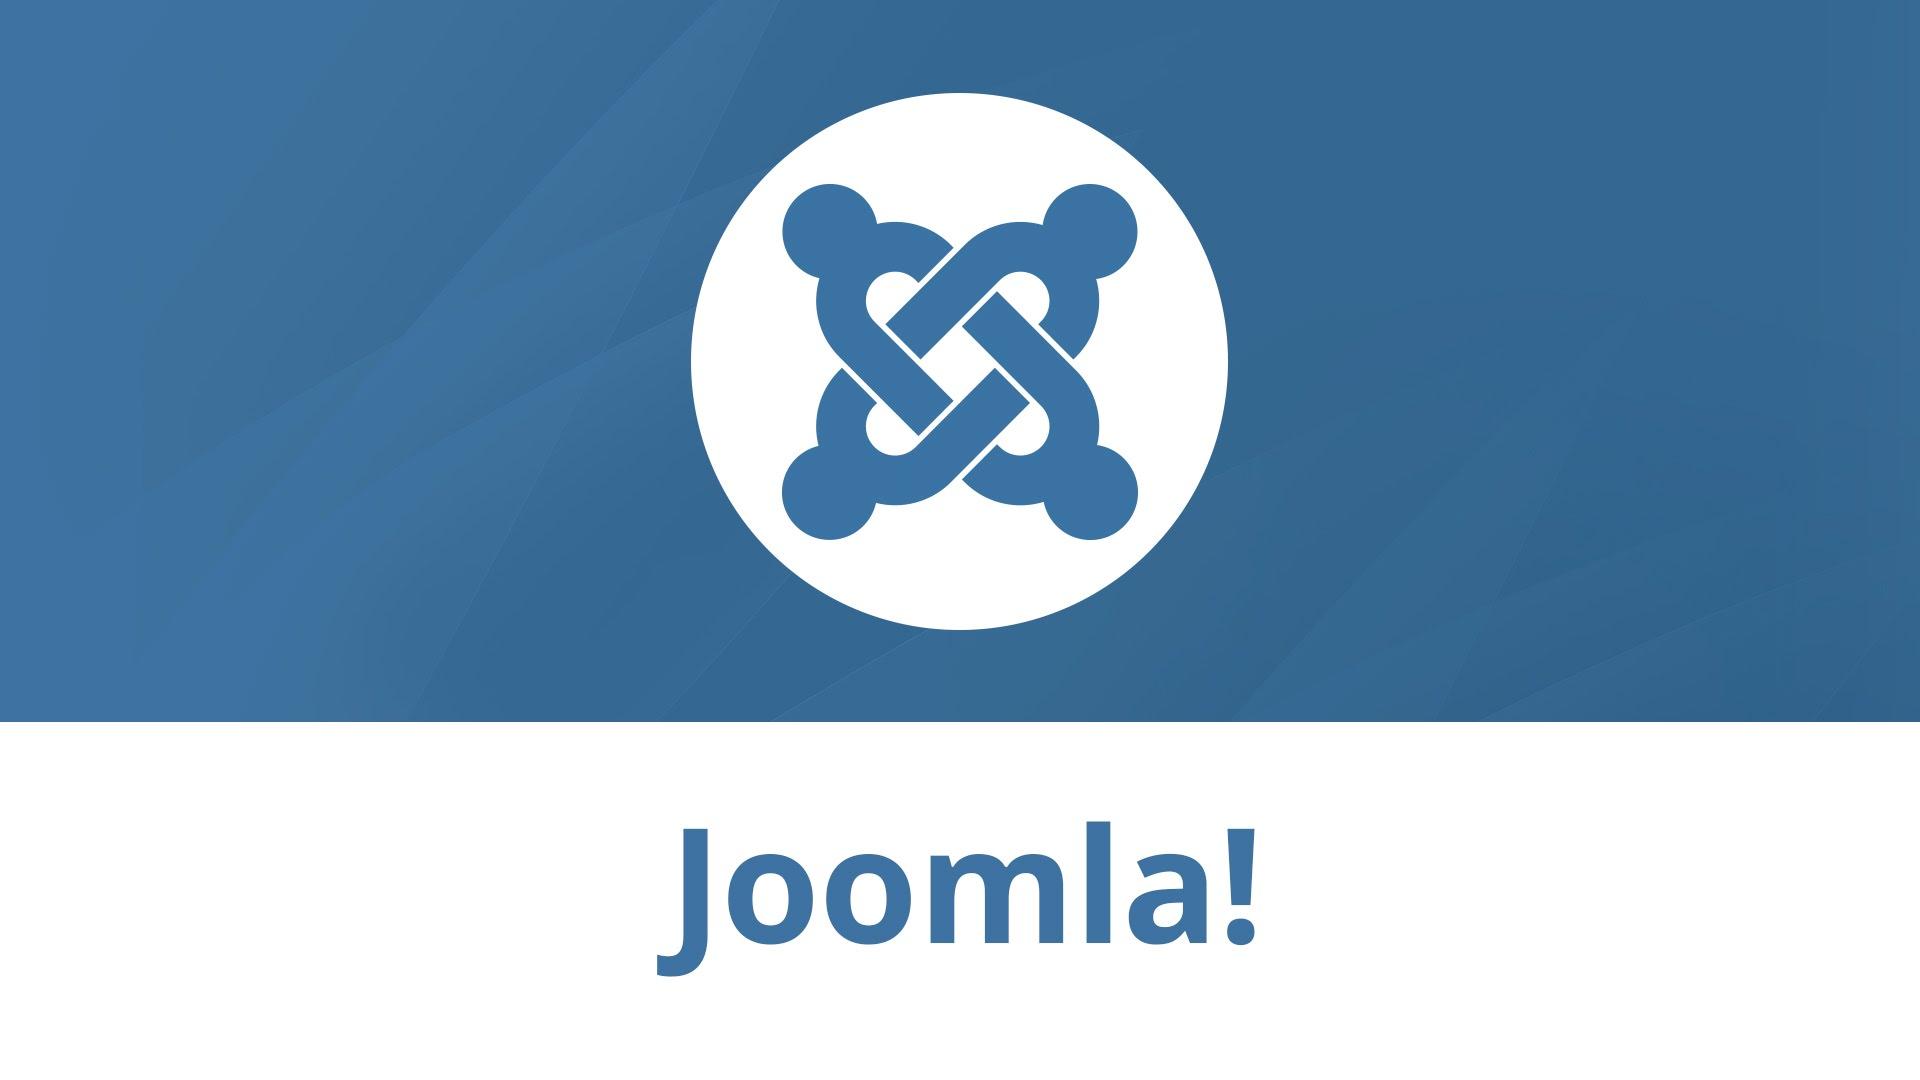 7 Best Joomla Hosting Providers & Plans